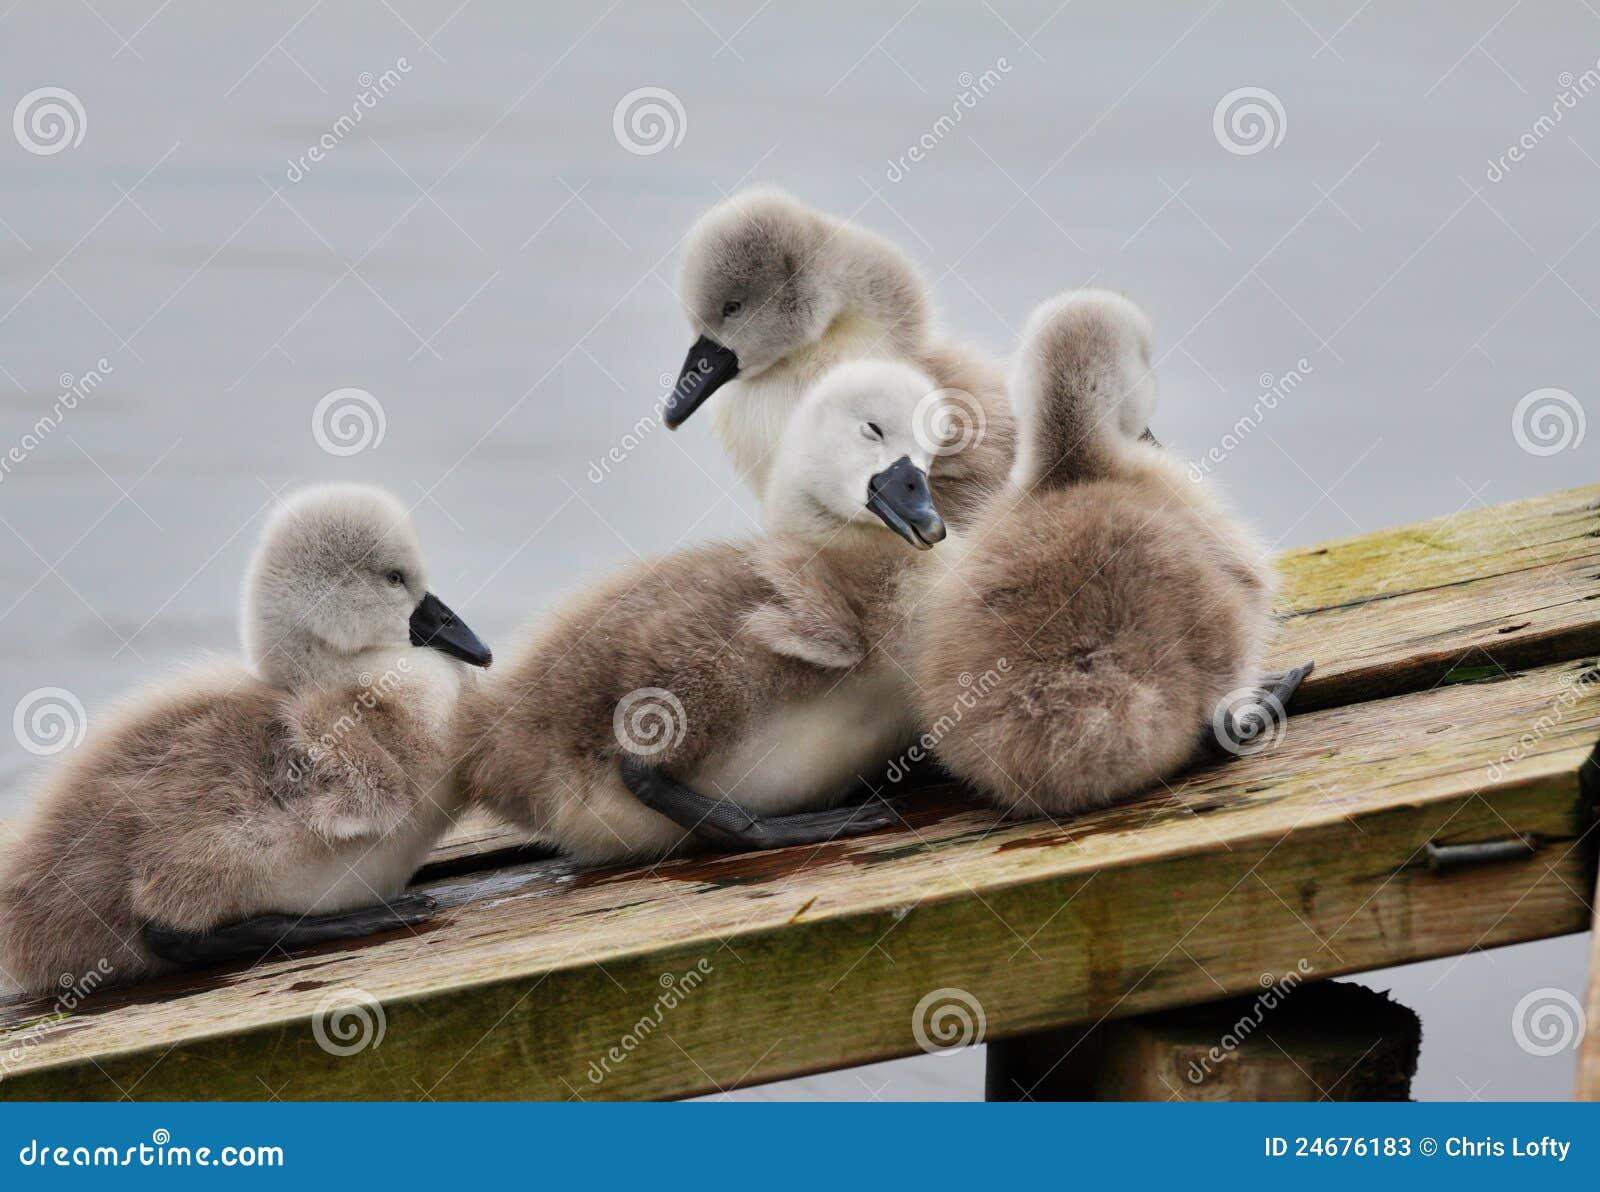 Family of Cygnets huddled together